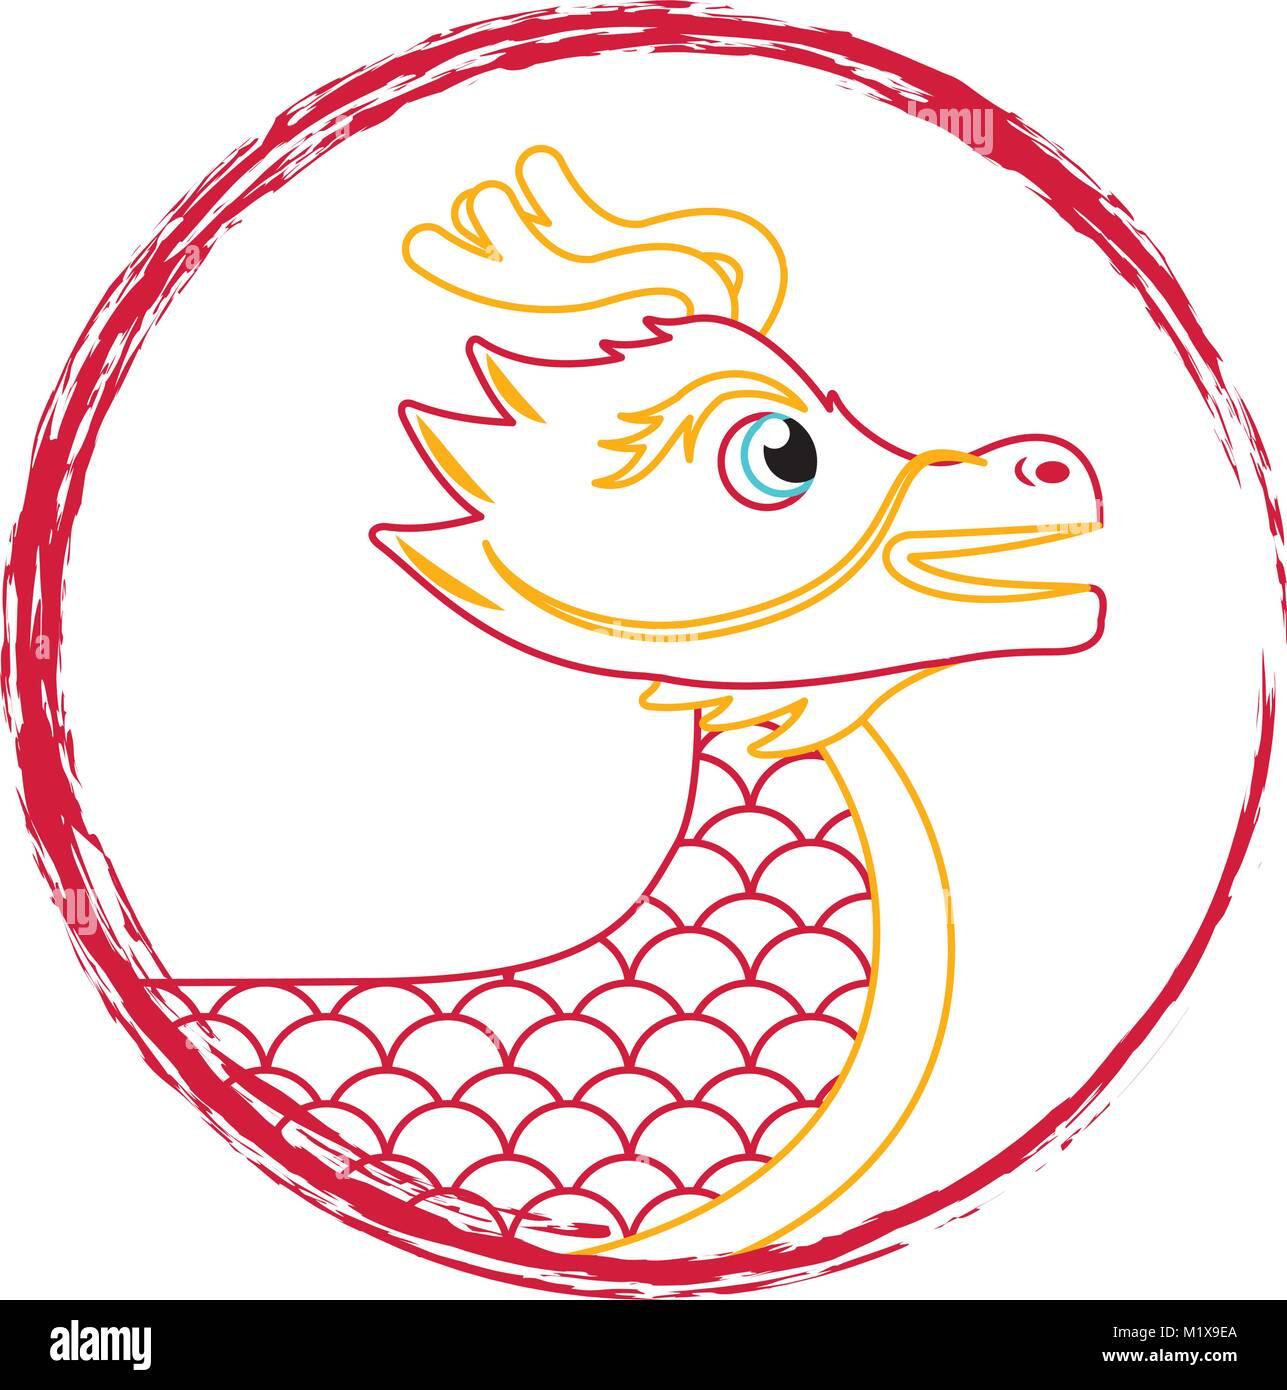 drawing red chinese dragon symbol - Stock Image